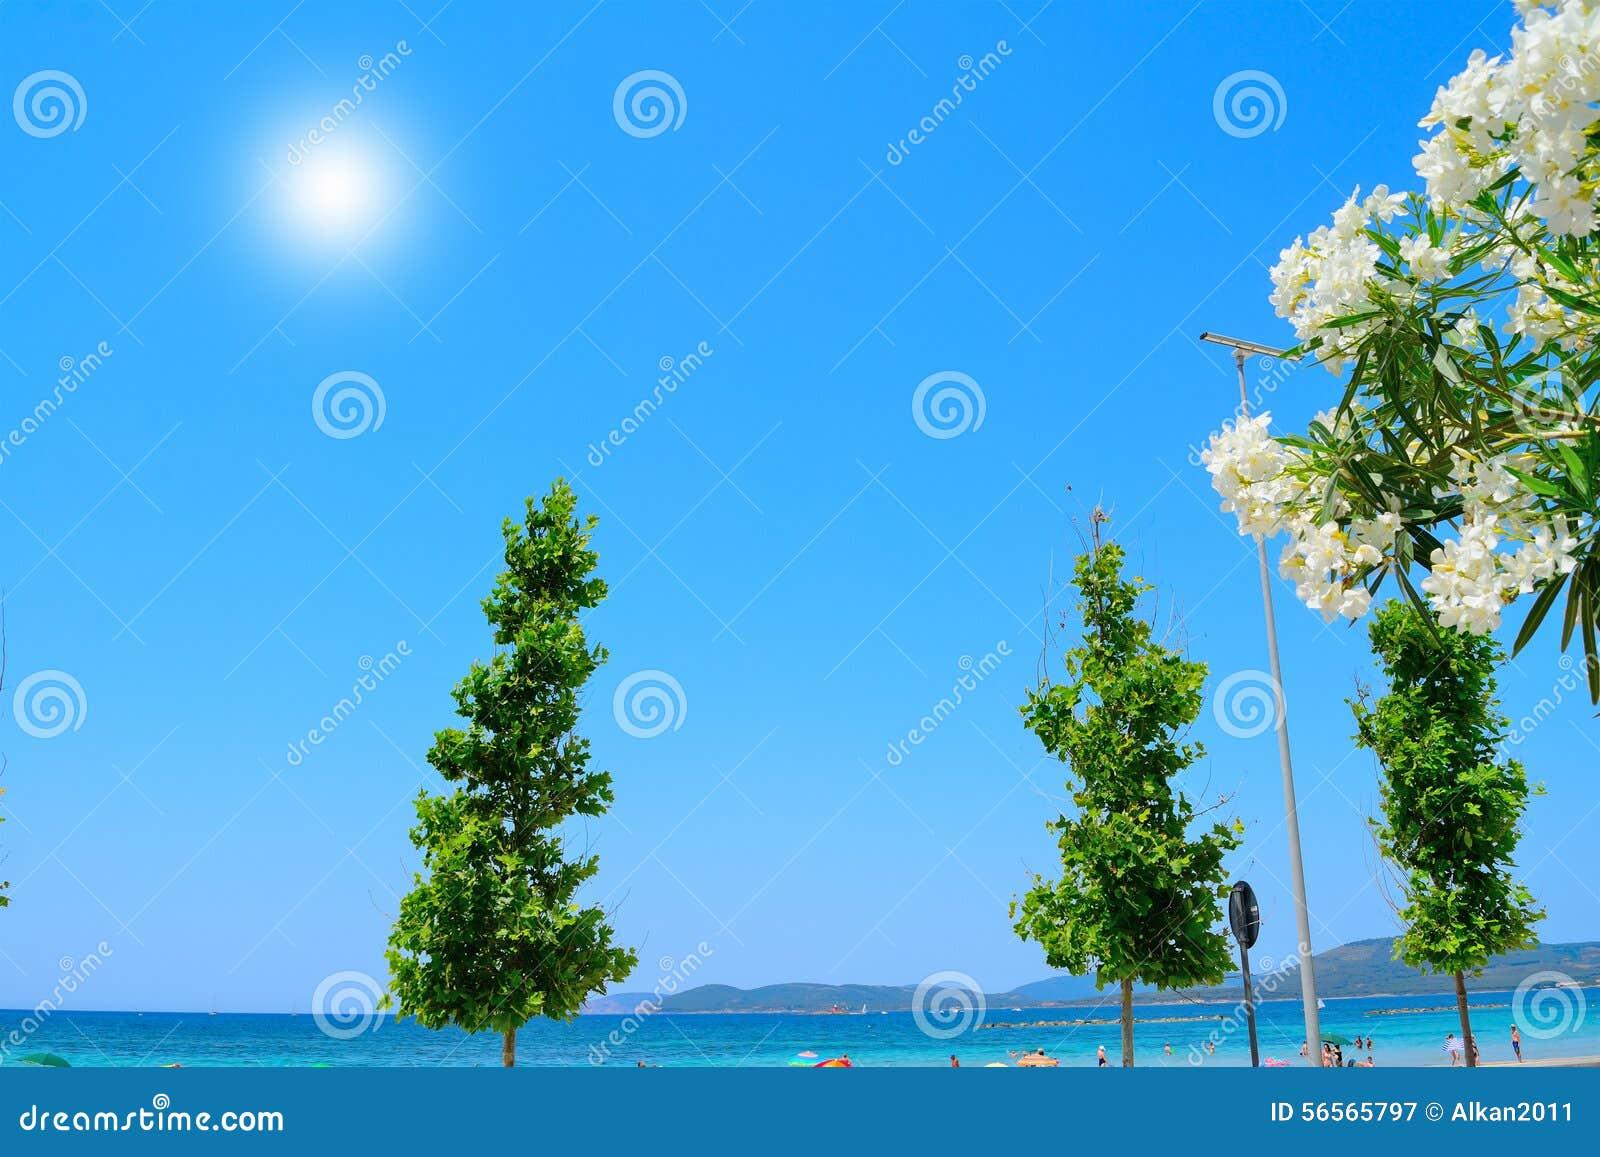 Download Άσπρα Oleanders και άλλες εγκαταστάσεις από την ακτή Στοκ Εικόνα - εικόνα από oleander, παραλία: 56565797